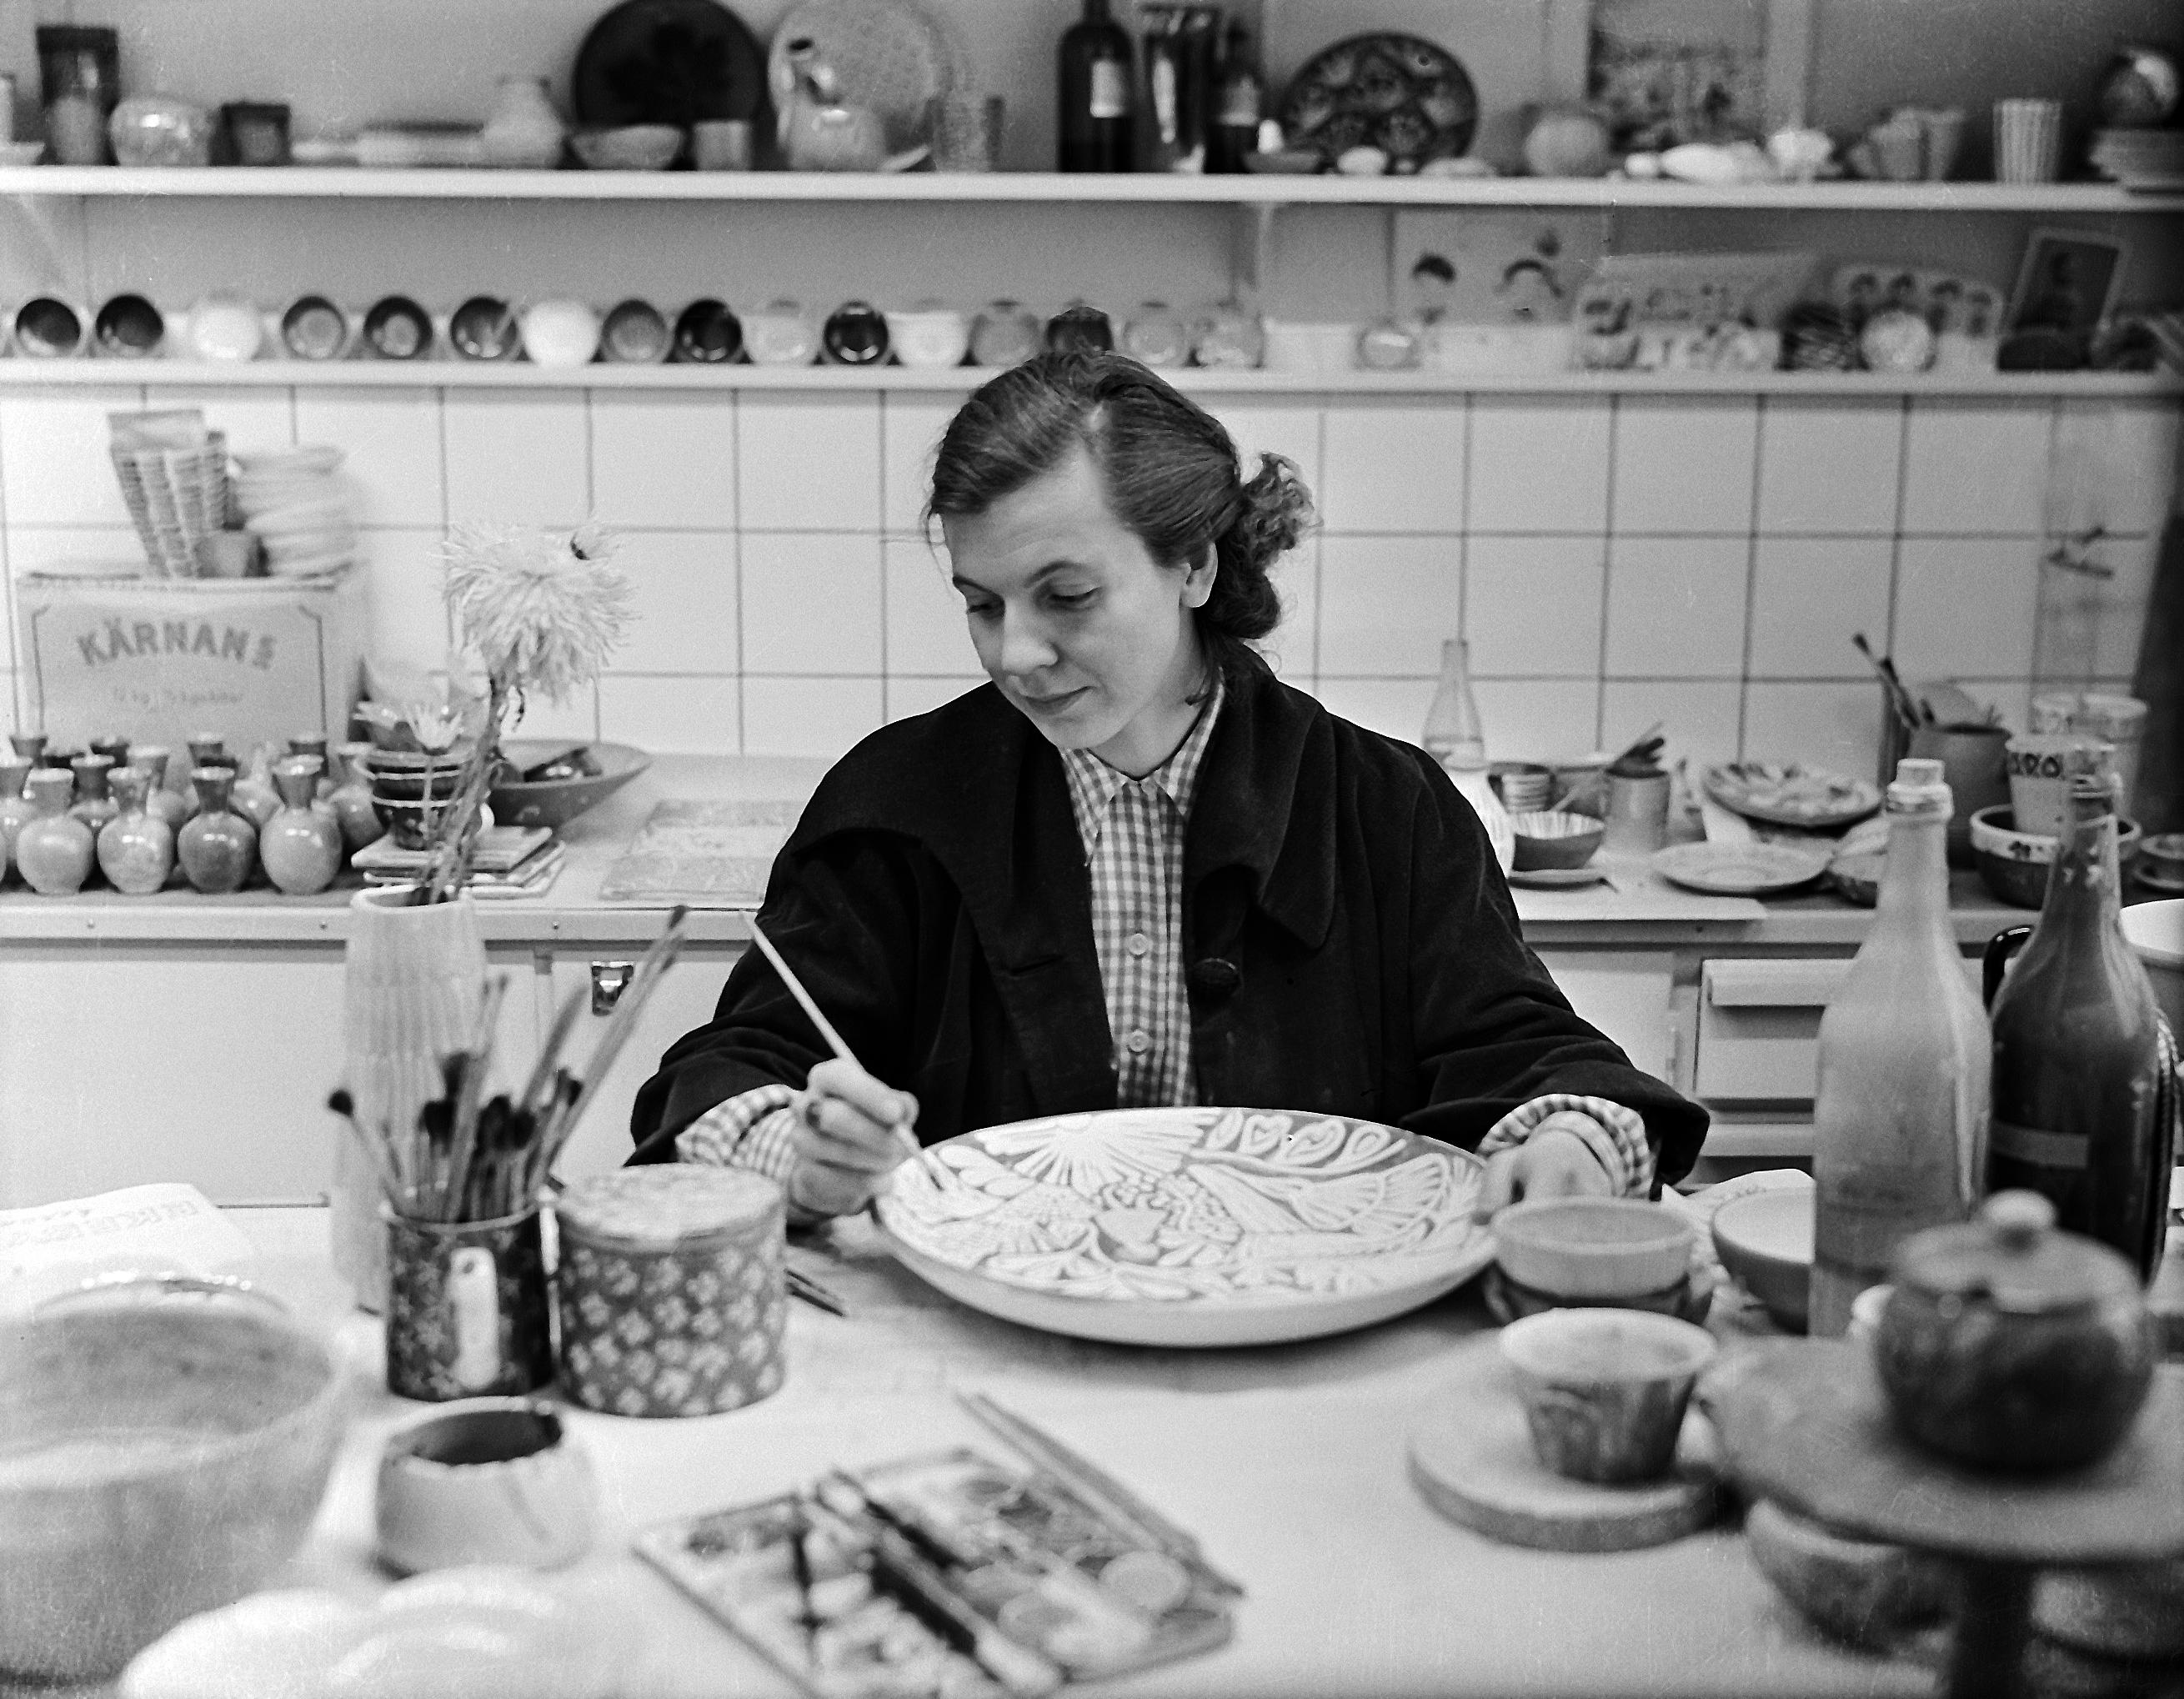 Ingrid Atterberg. Photographer and year unknown (Upplandsmuseet)